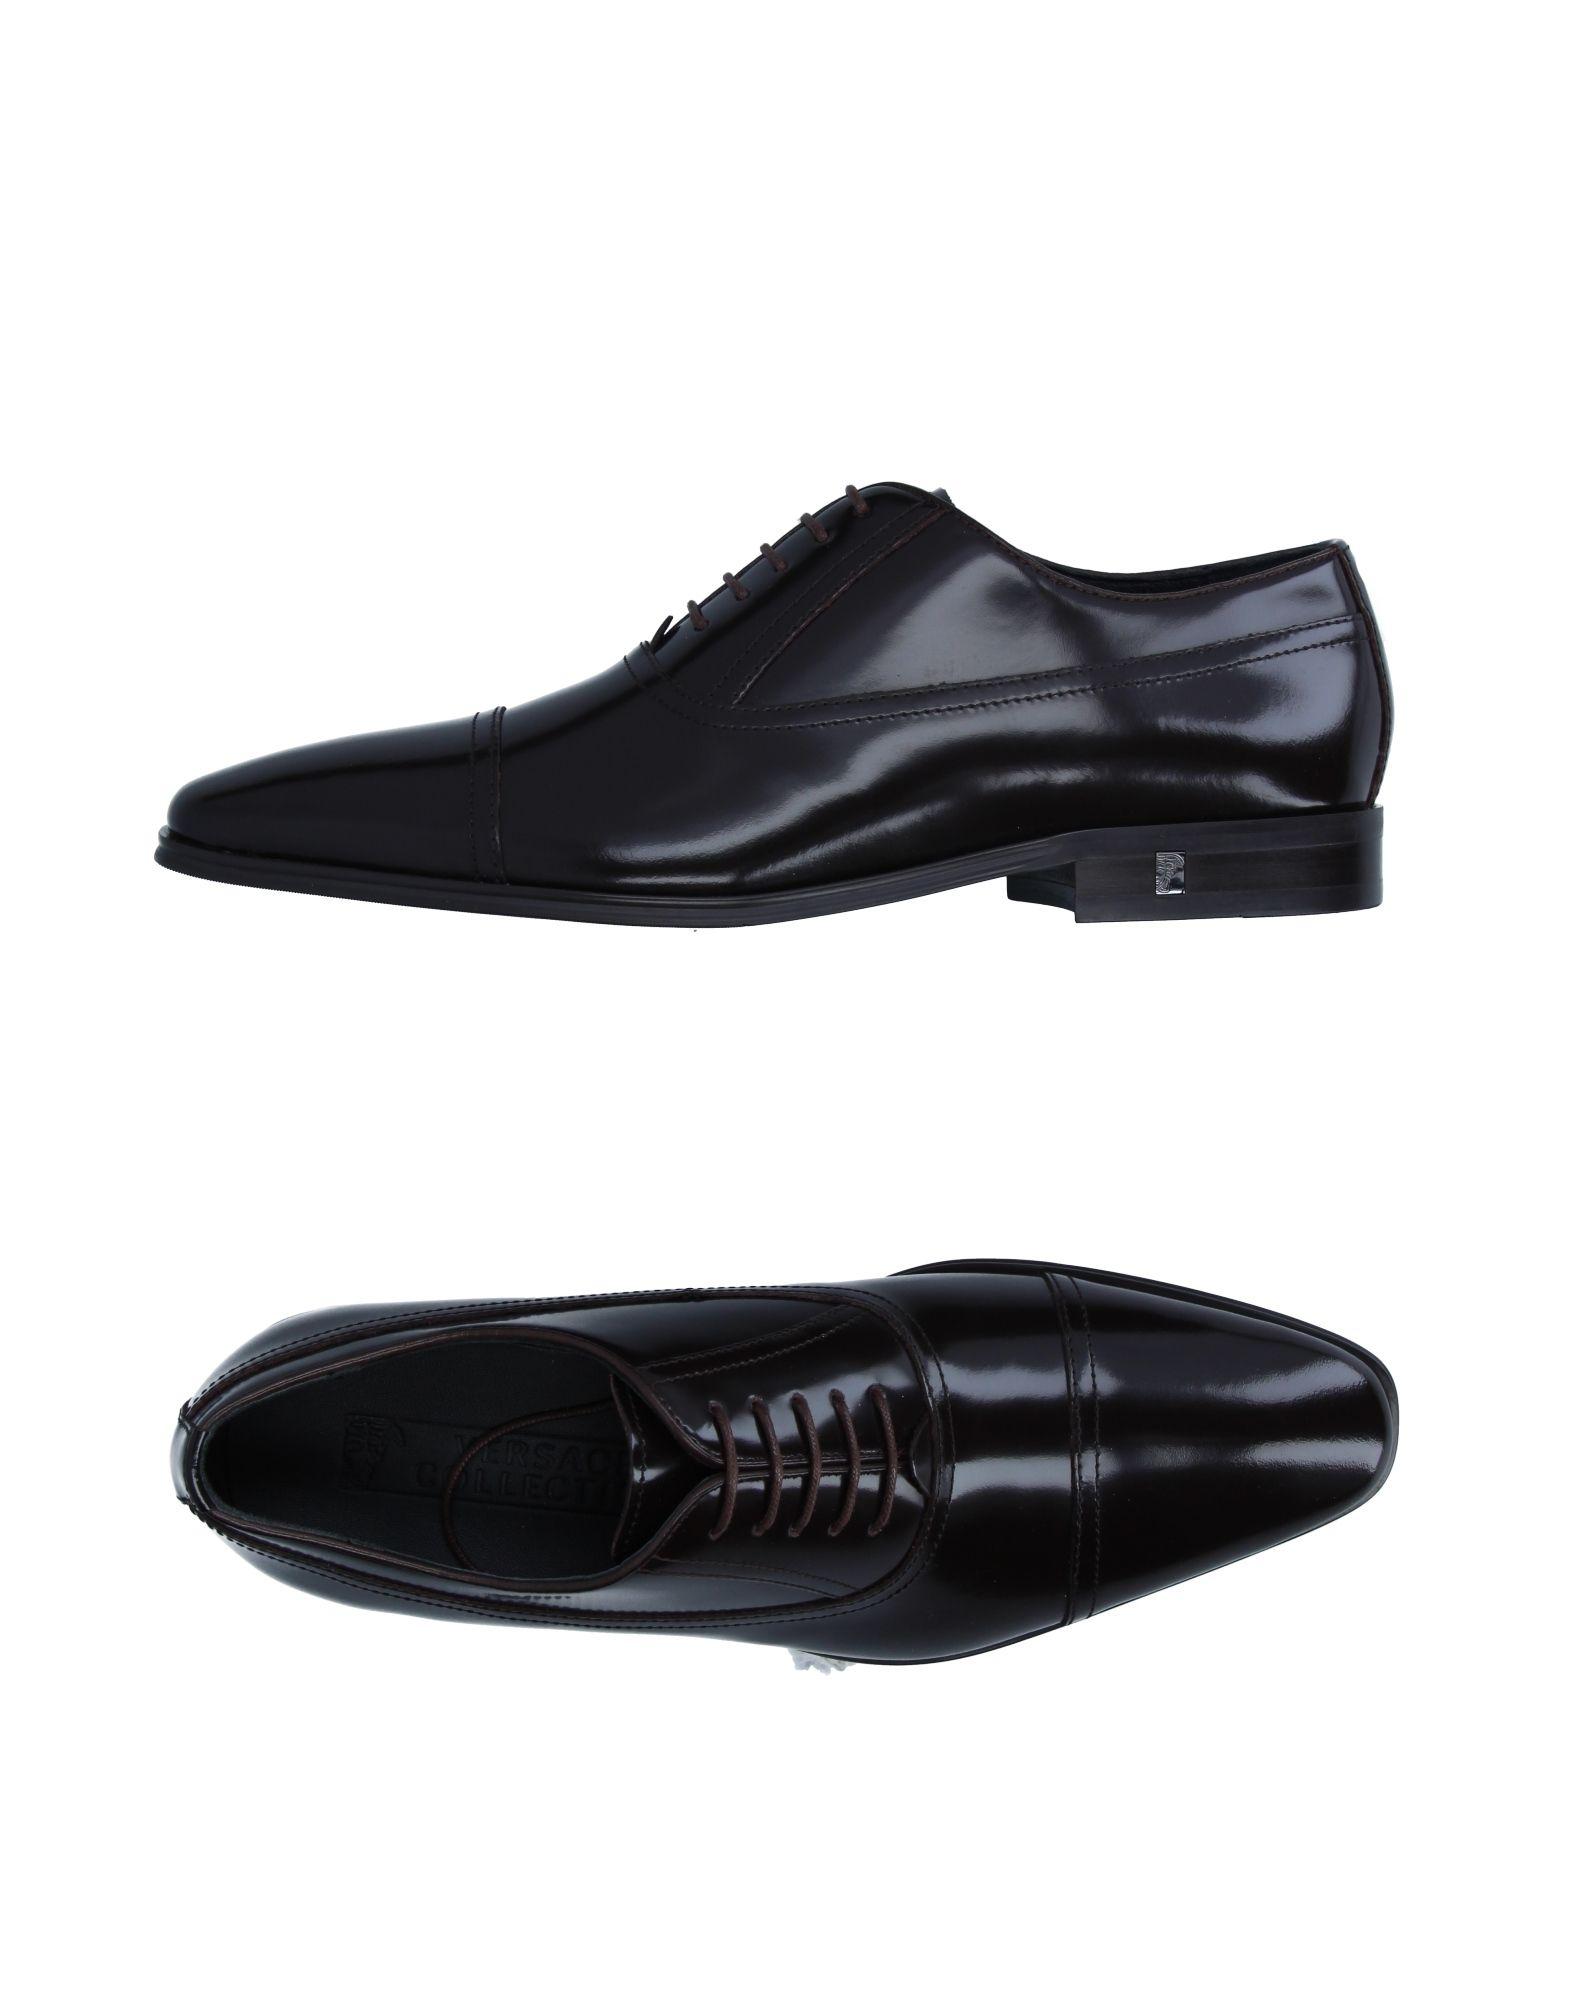 Versace Collection Schnürschuhe Herren  11311426TT Gute Qualität beliebte Schuhe